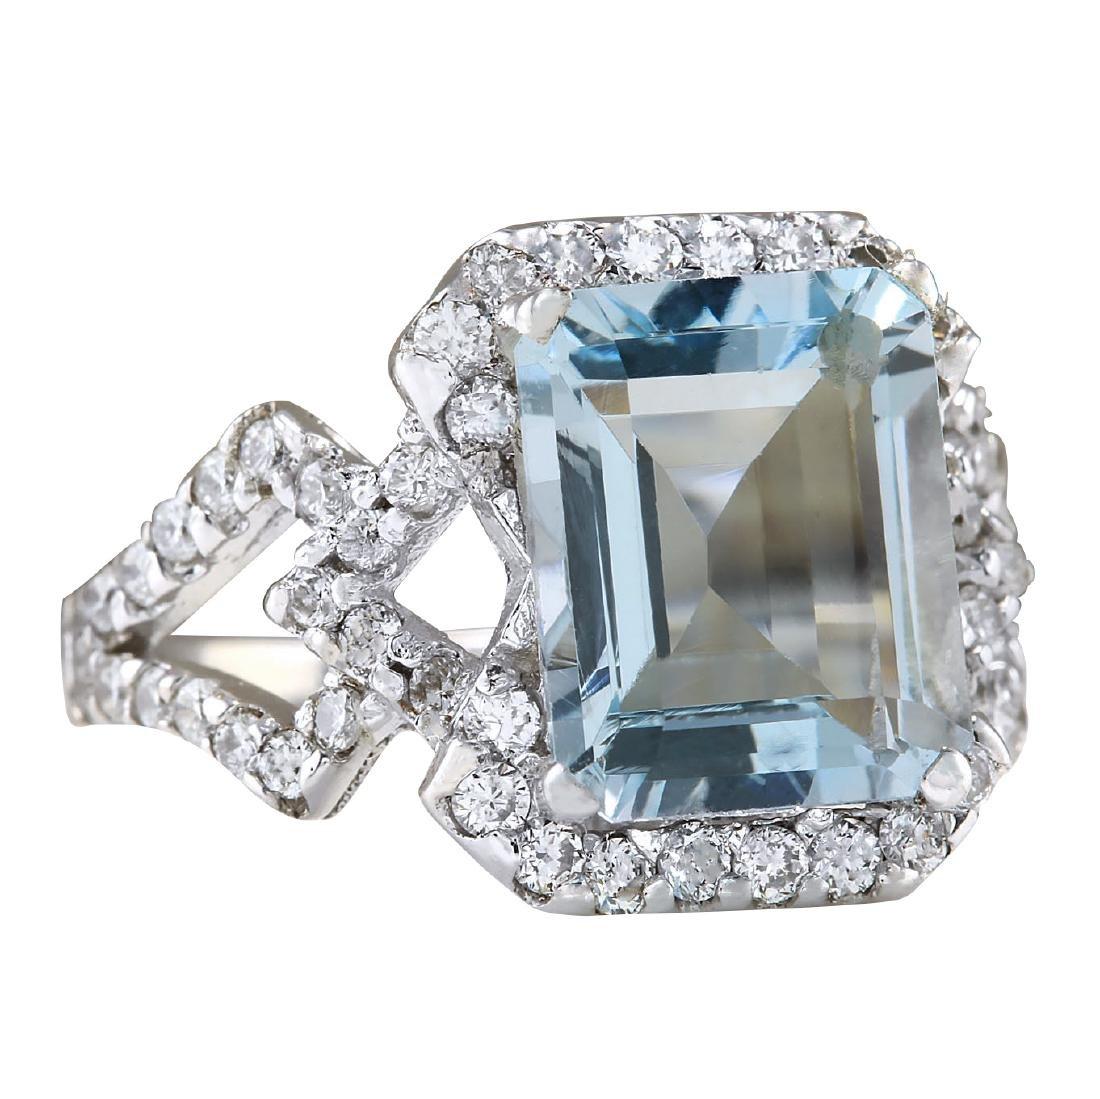 4.26CTW Natural Aquamarine And Diamond Ring In 18K - 2